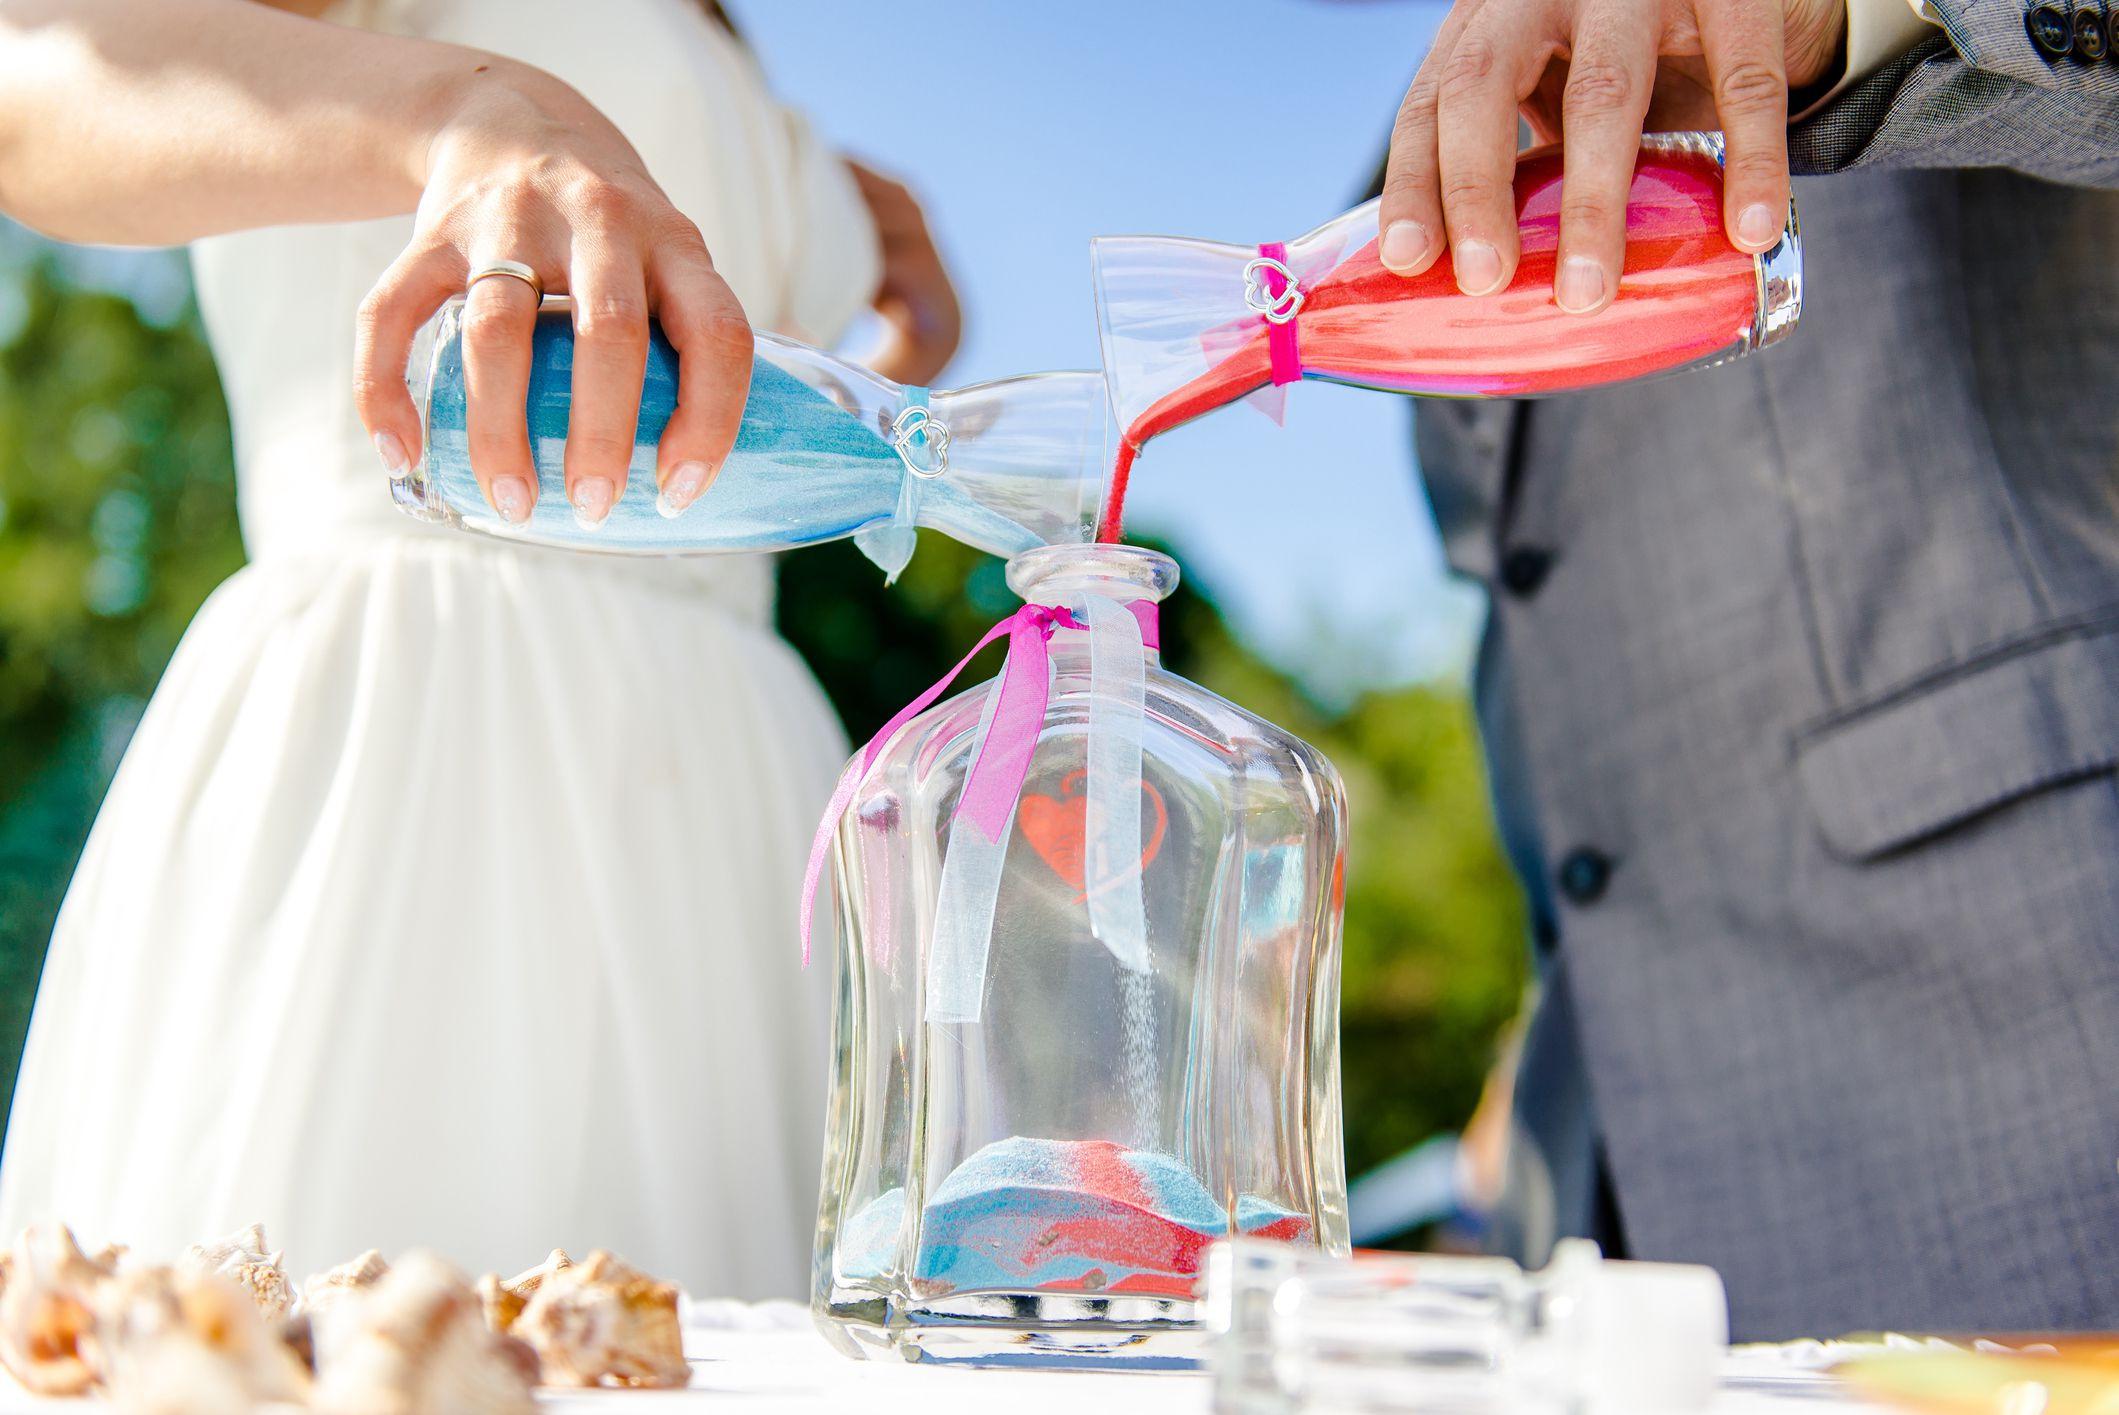 sand for wedding unity vase of wedding sand ceremony wording regarding sandwedding 5a6f35afa18d9e0037025939